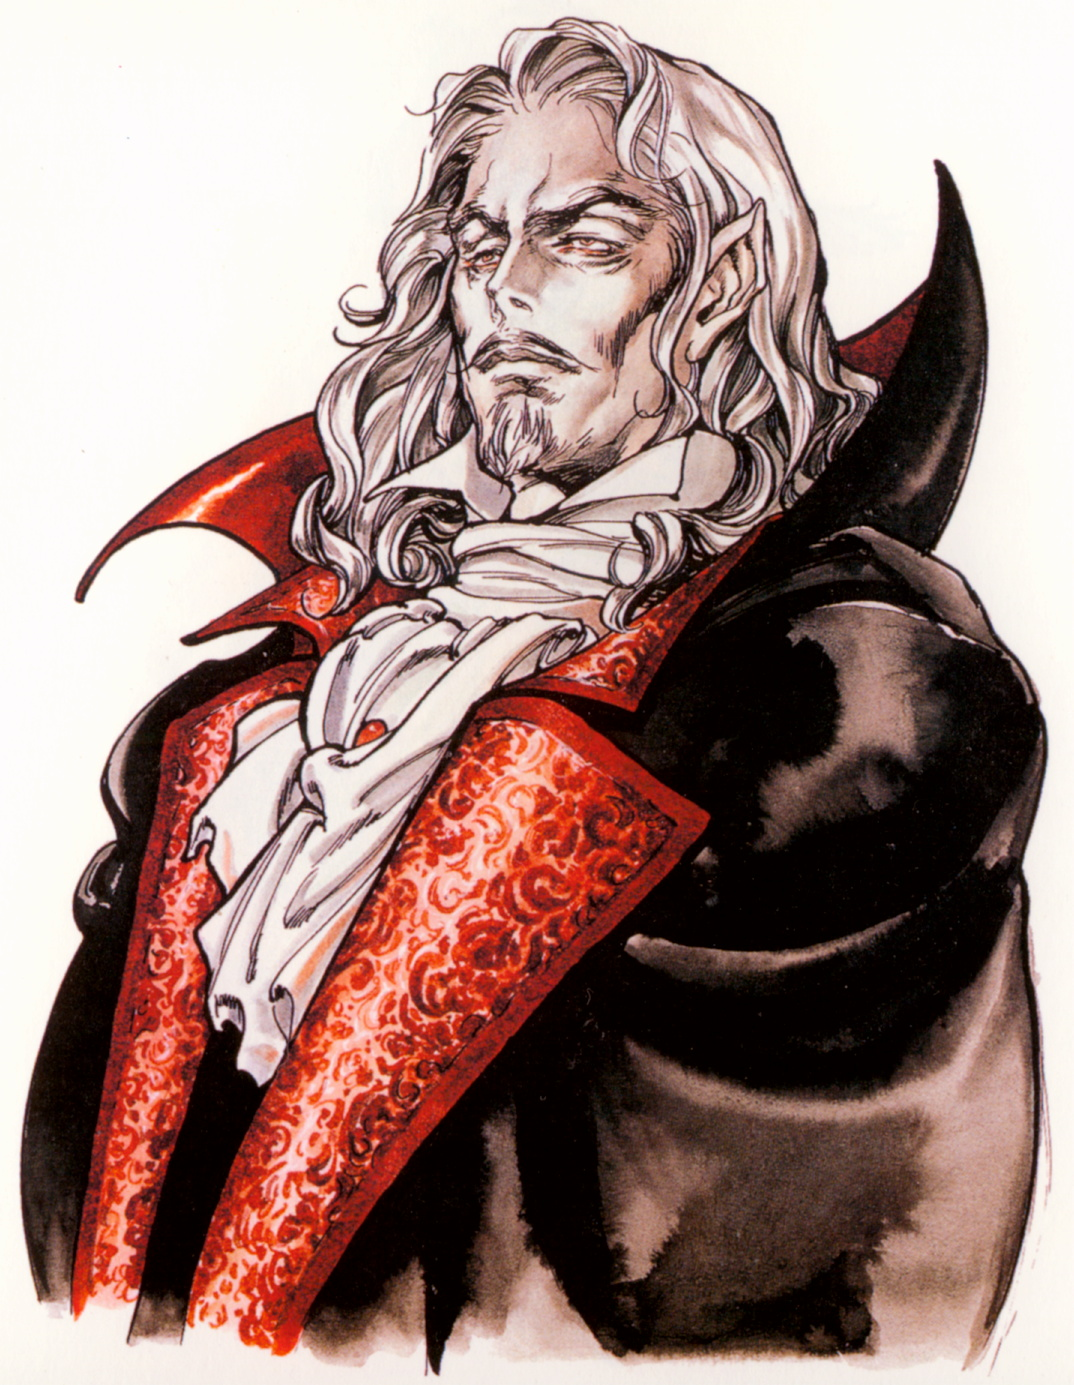 ABC de Pothook - Página 6 Dracula.(Castlevania).full.295042